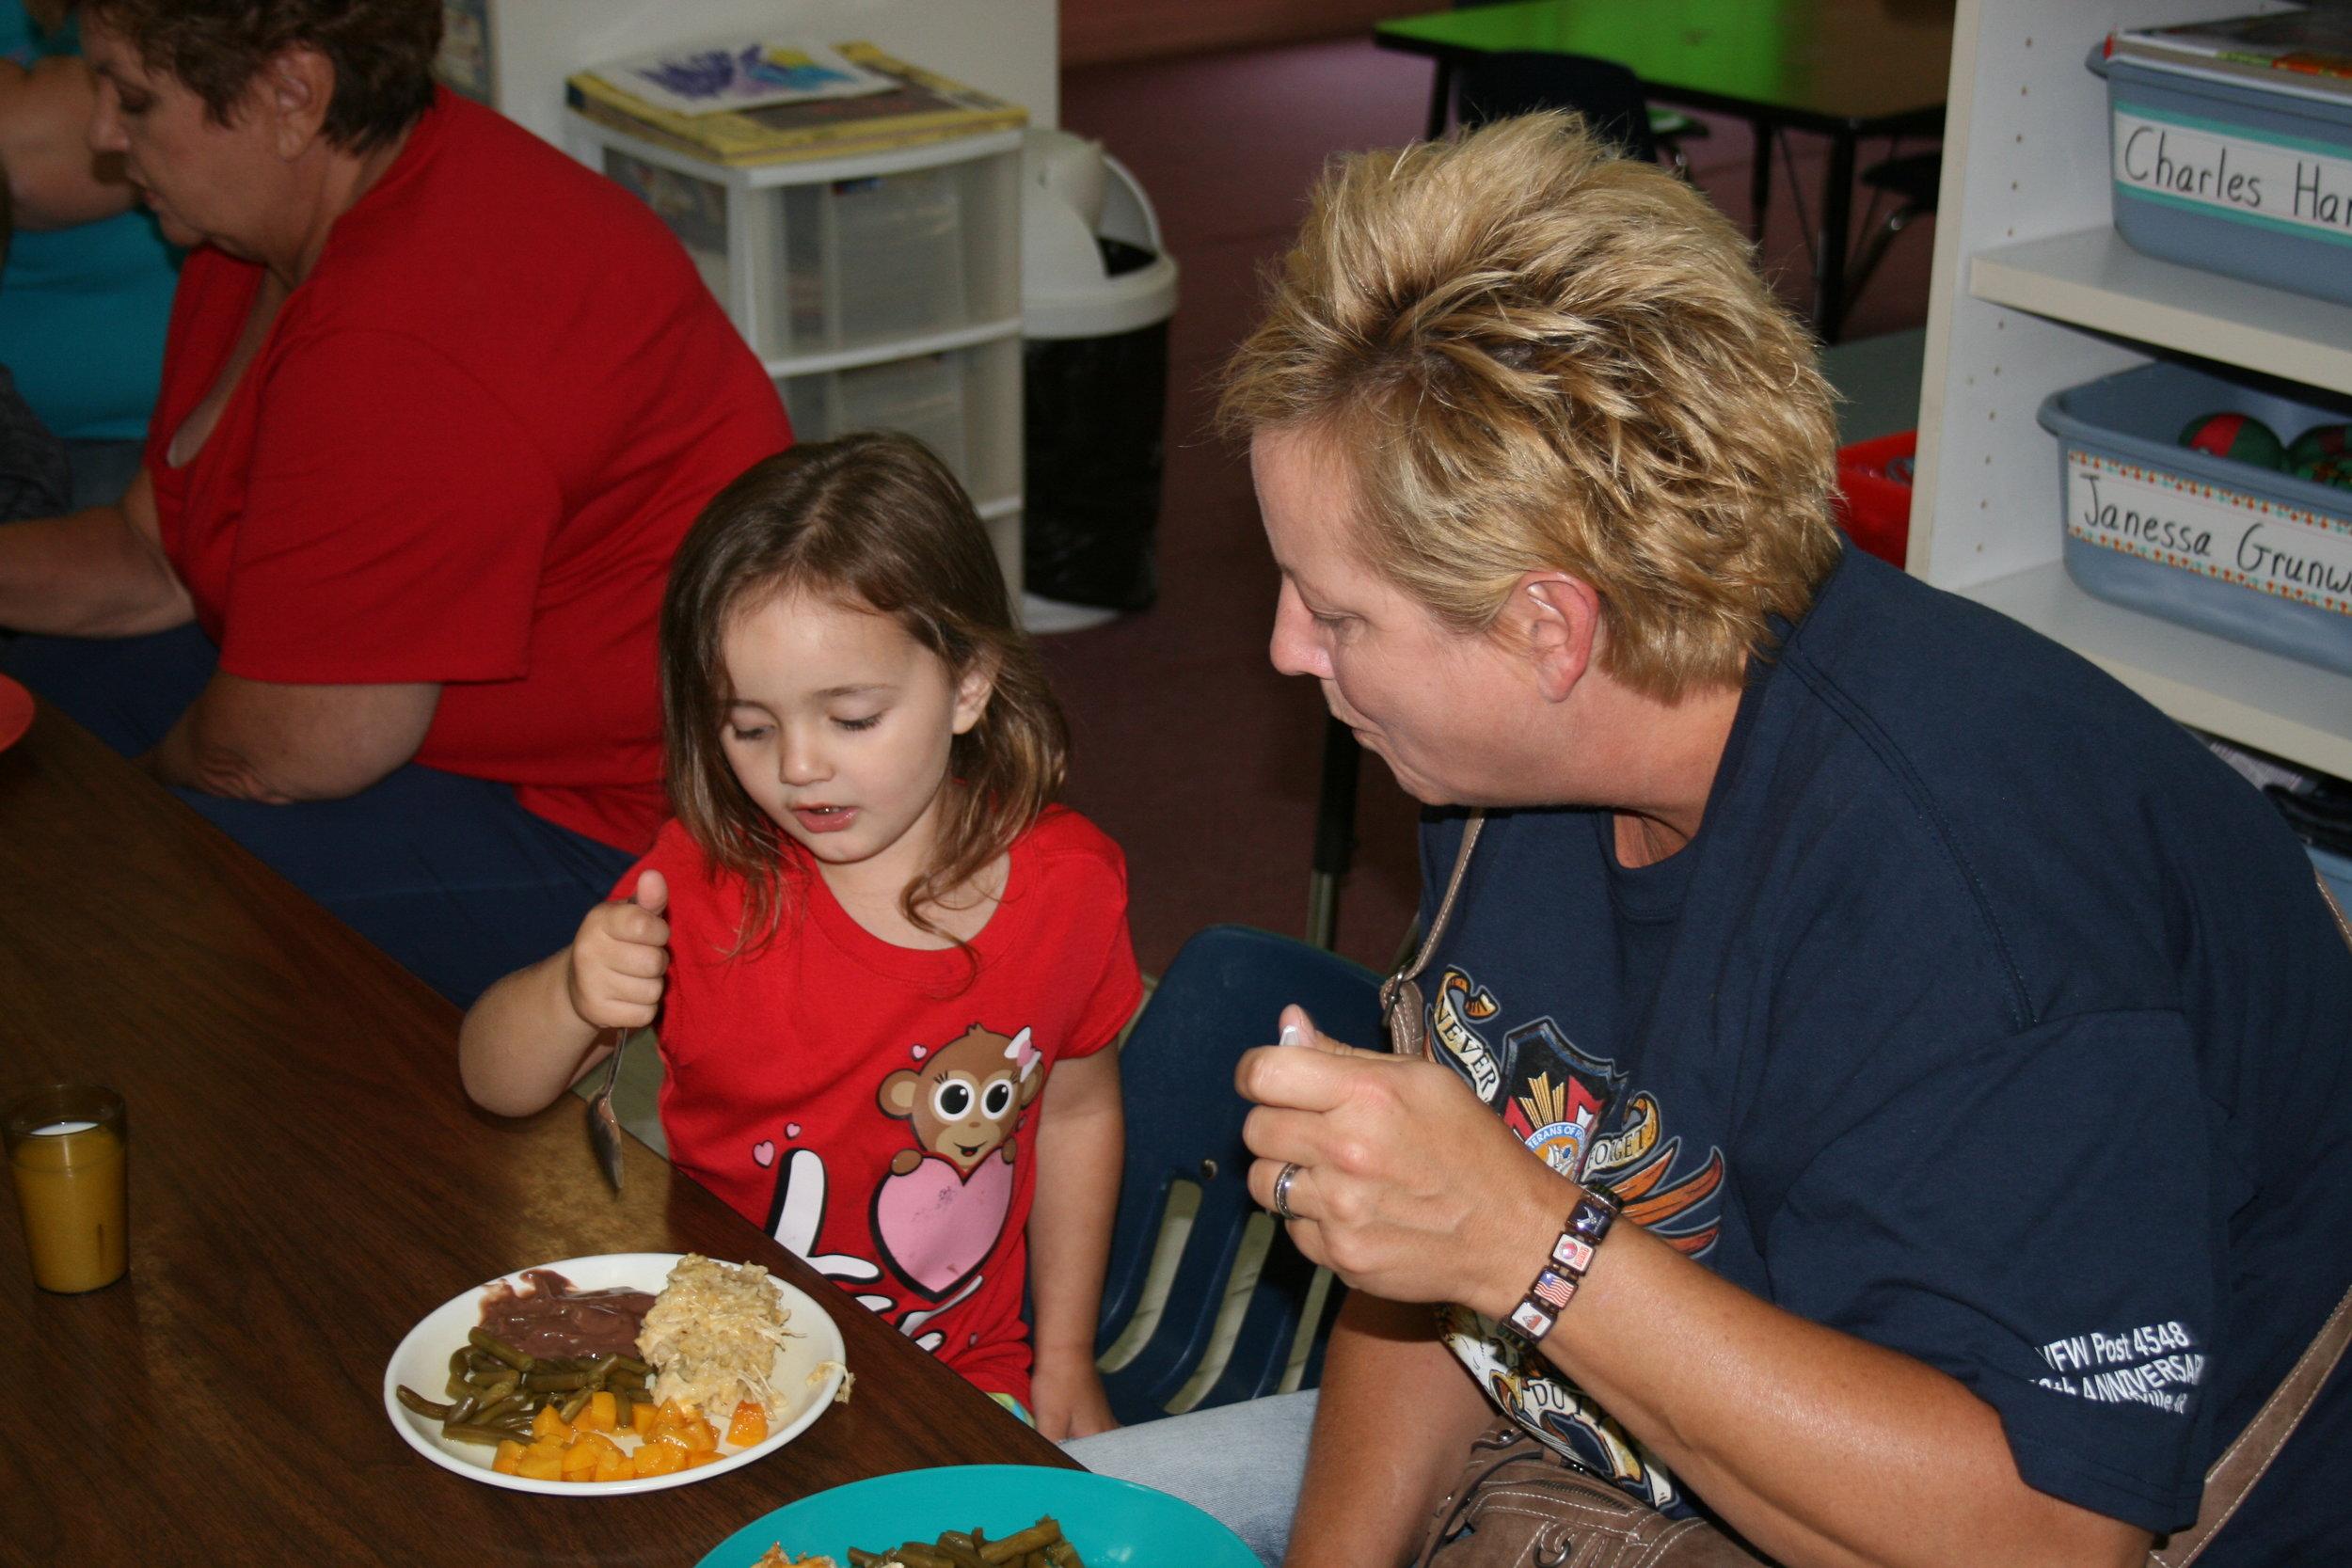 grandparents lunch 9-8-17 019.JPG